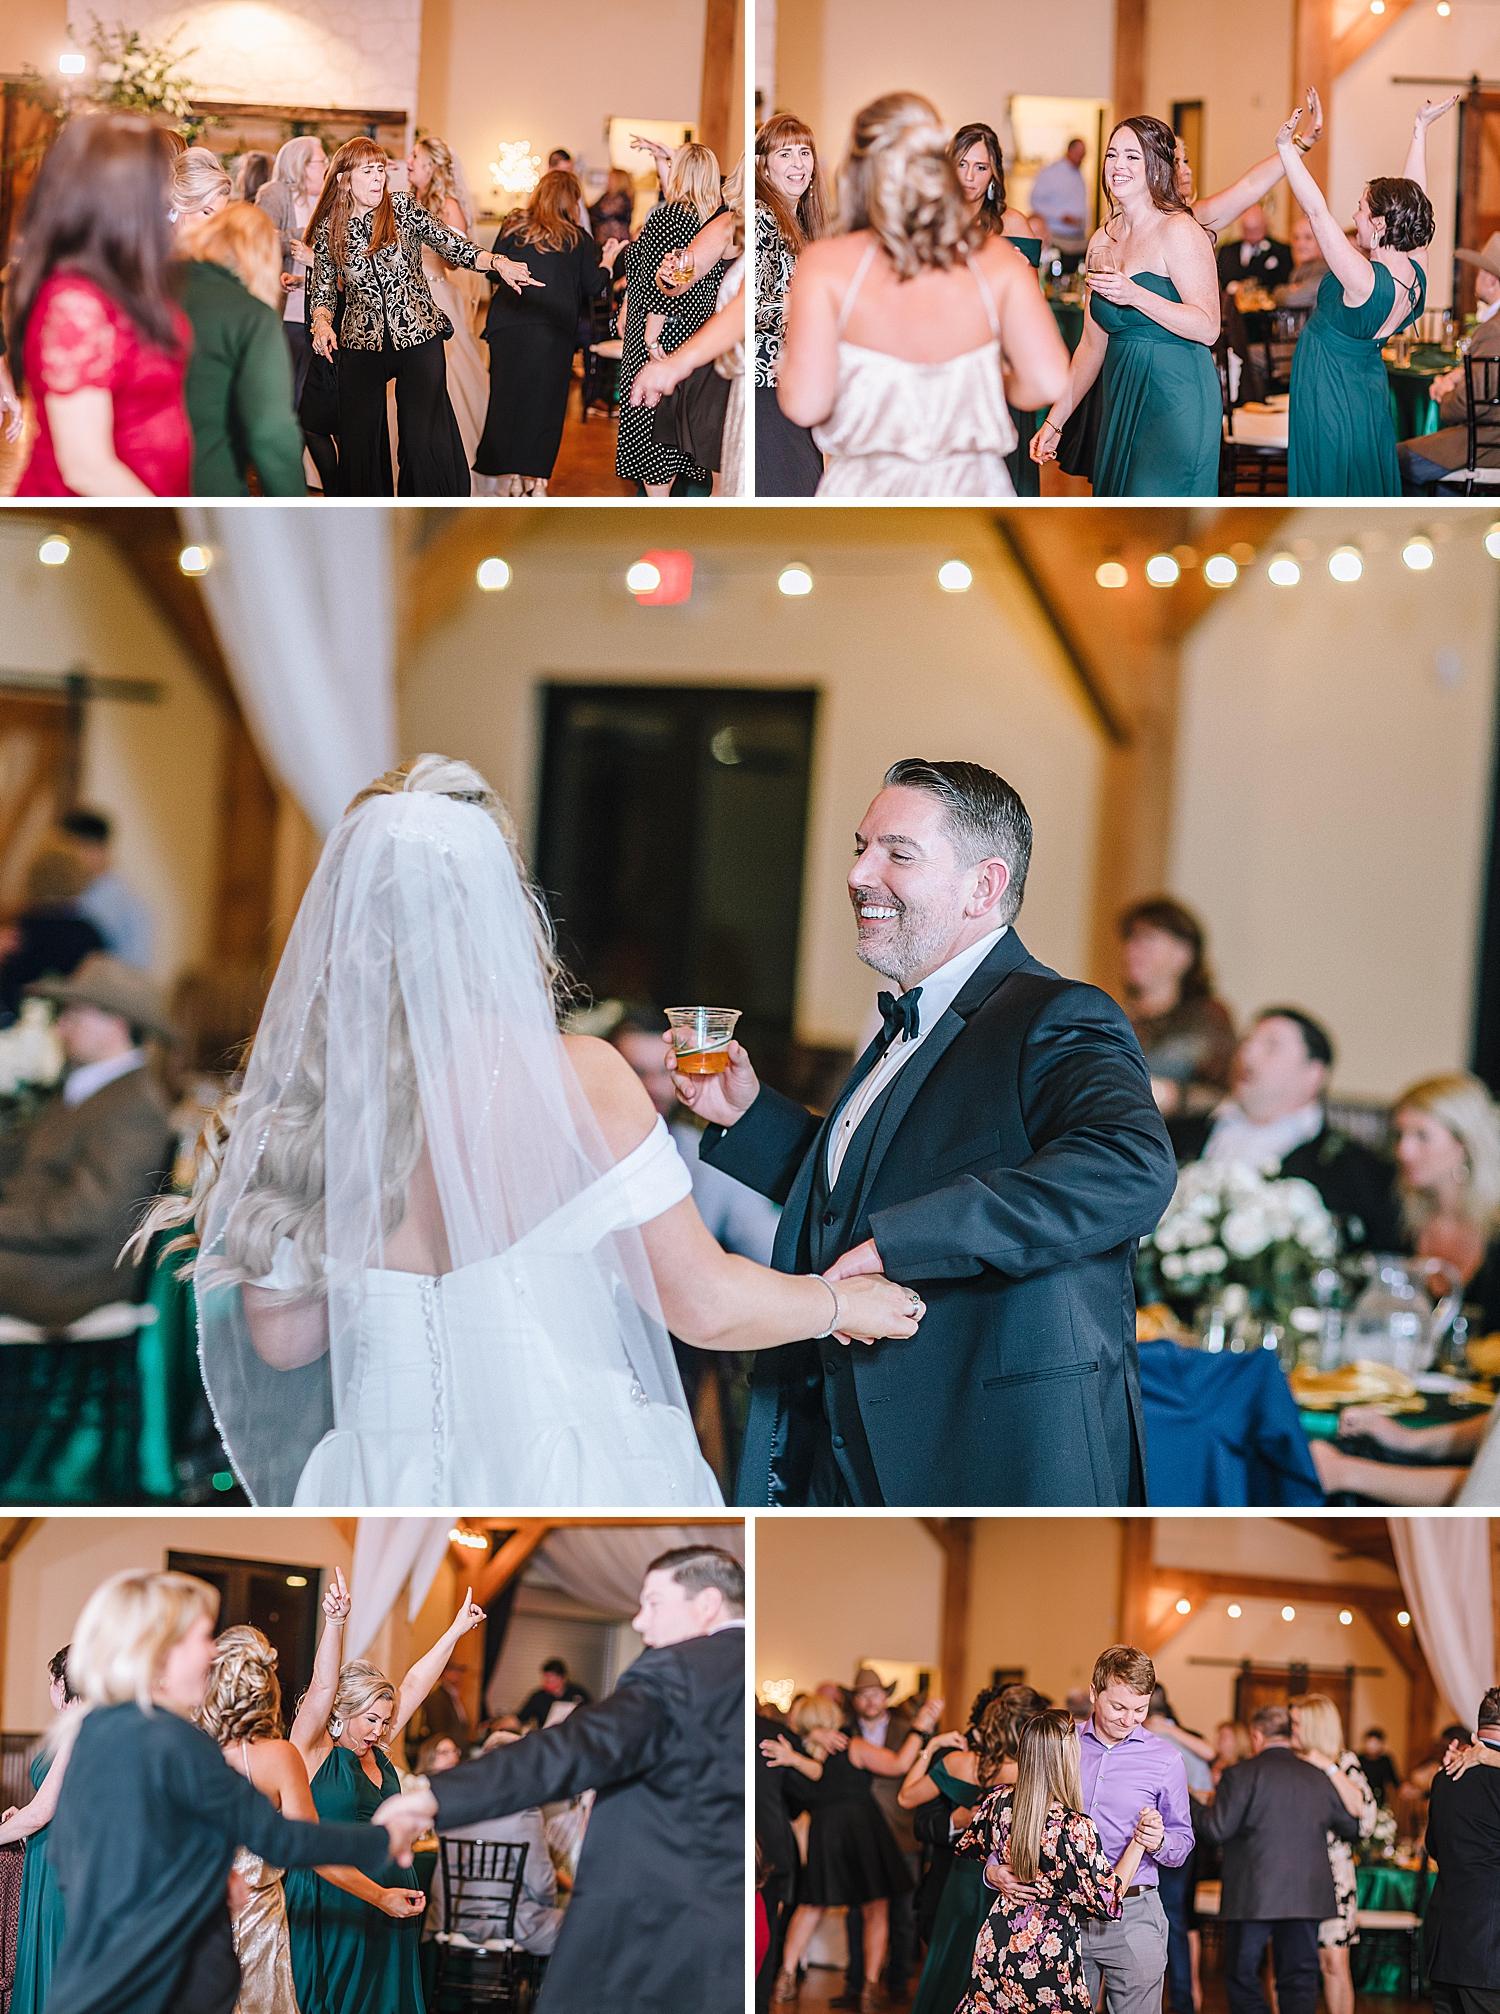 Magnolia-Halle-Wedding-San-Antonio-Texas-Bride-Grom_0095.jpg